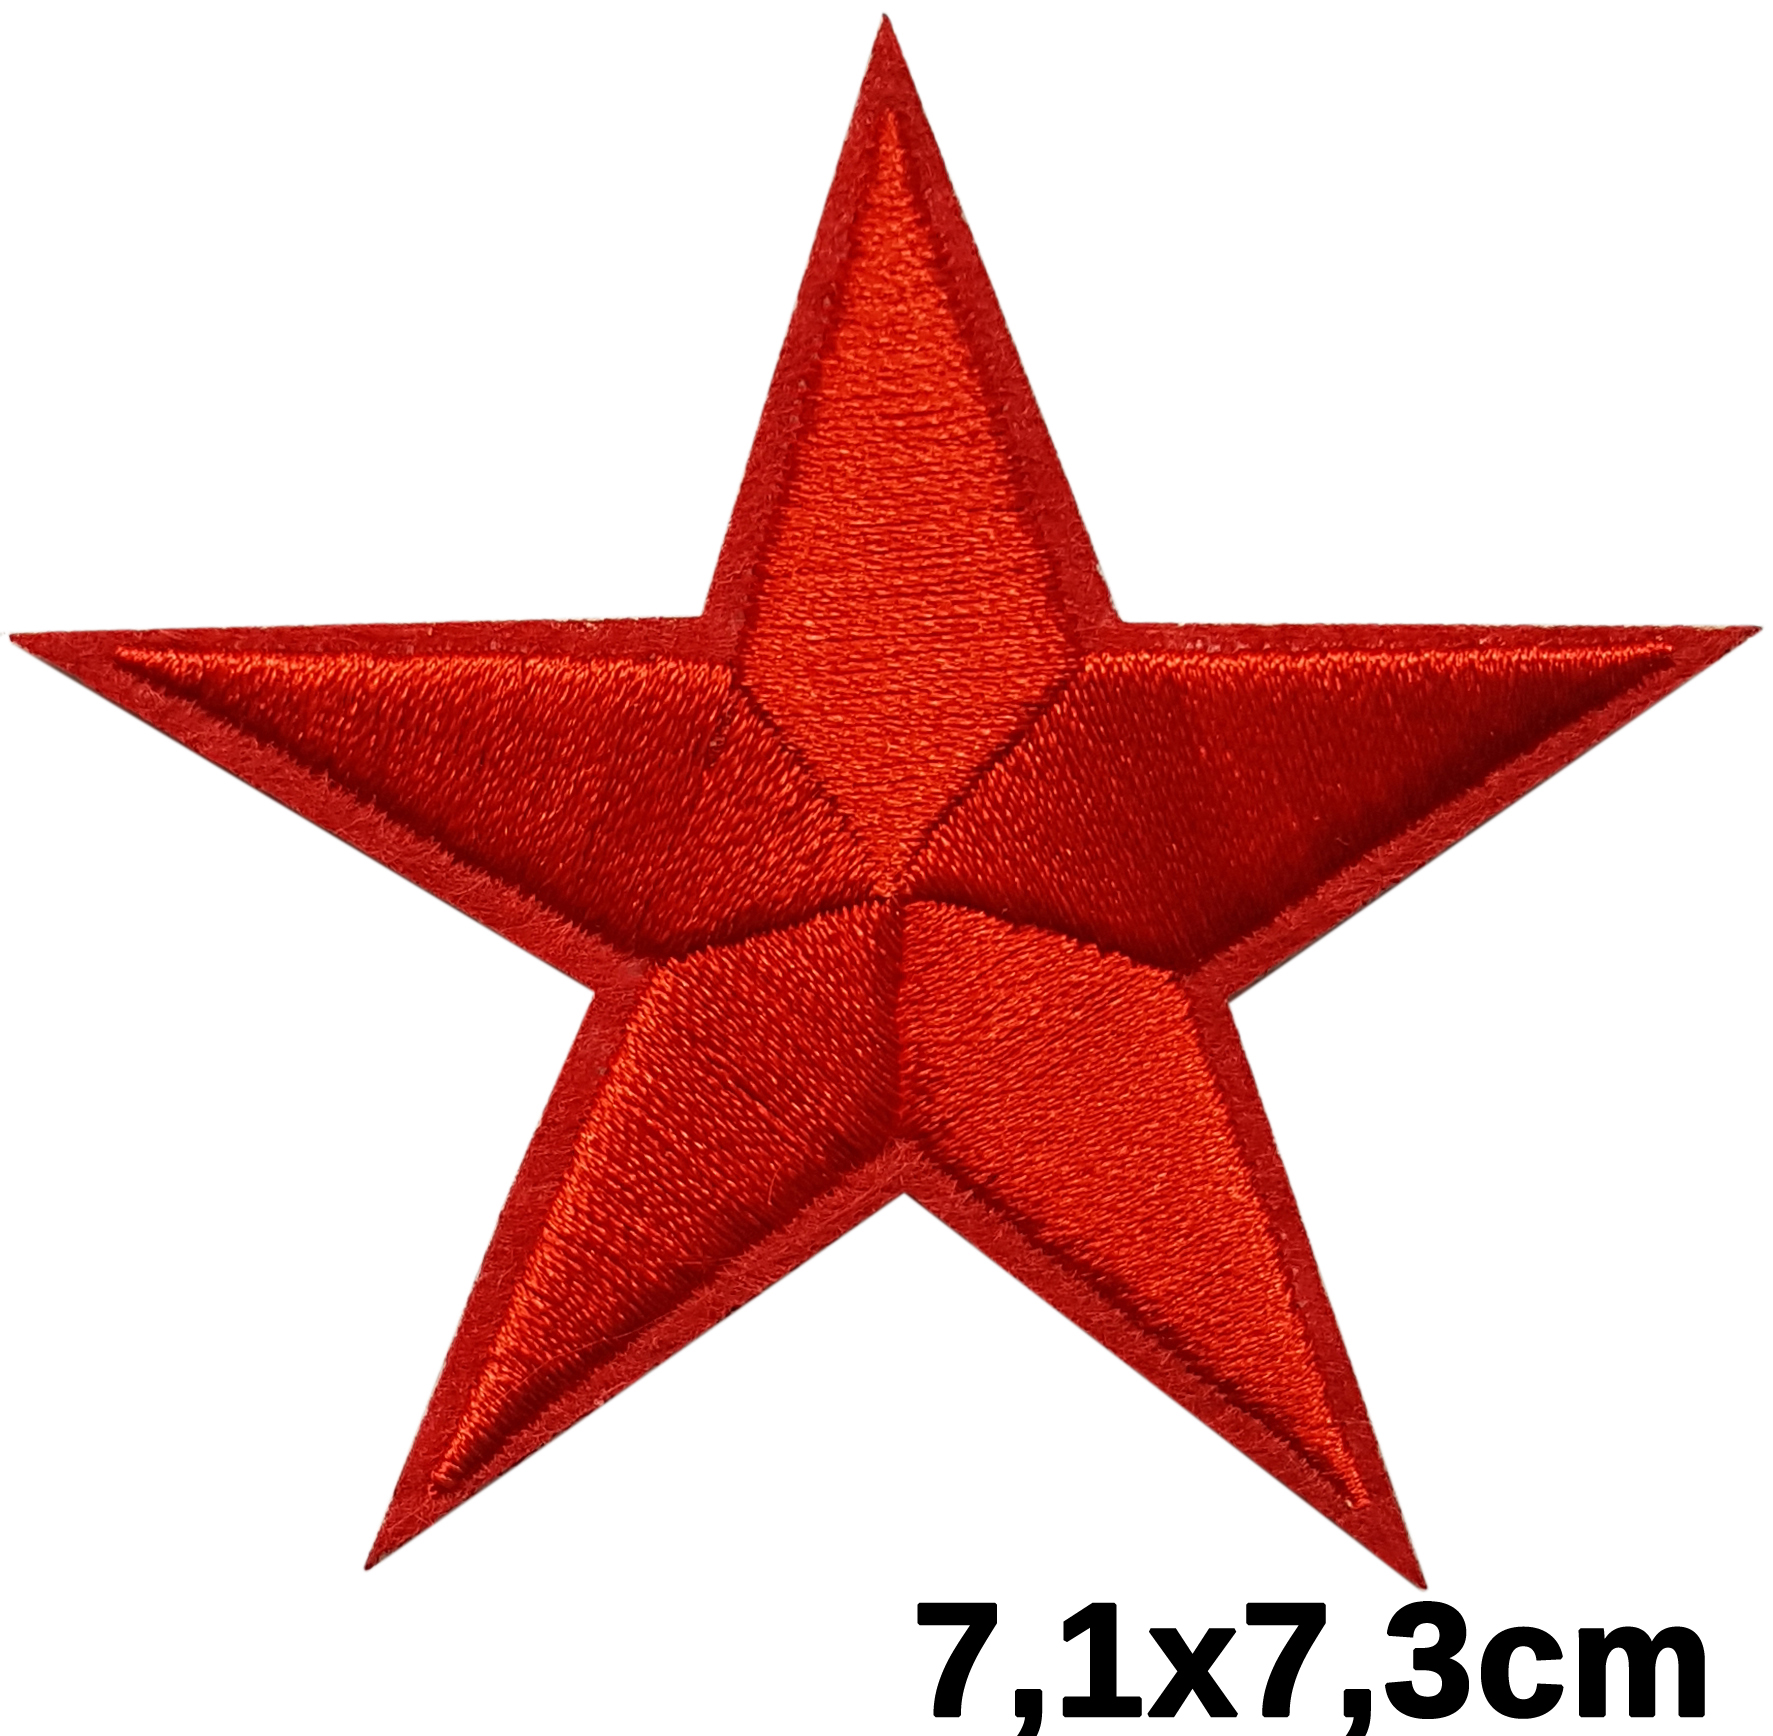 Patch thermocollant étoile rouge